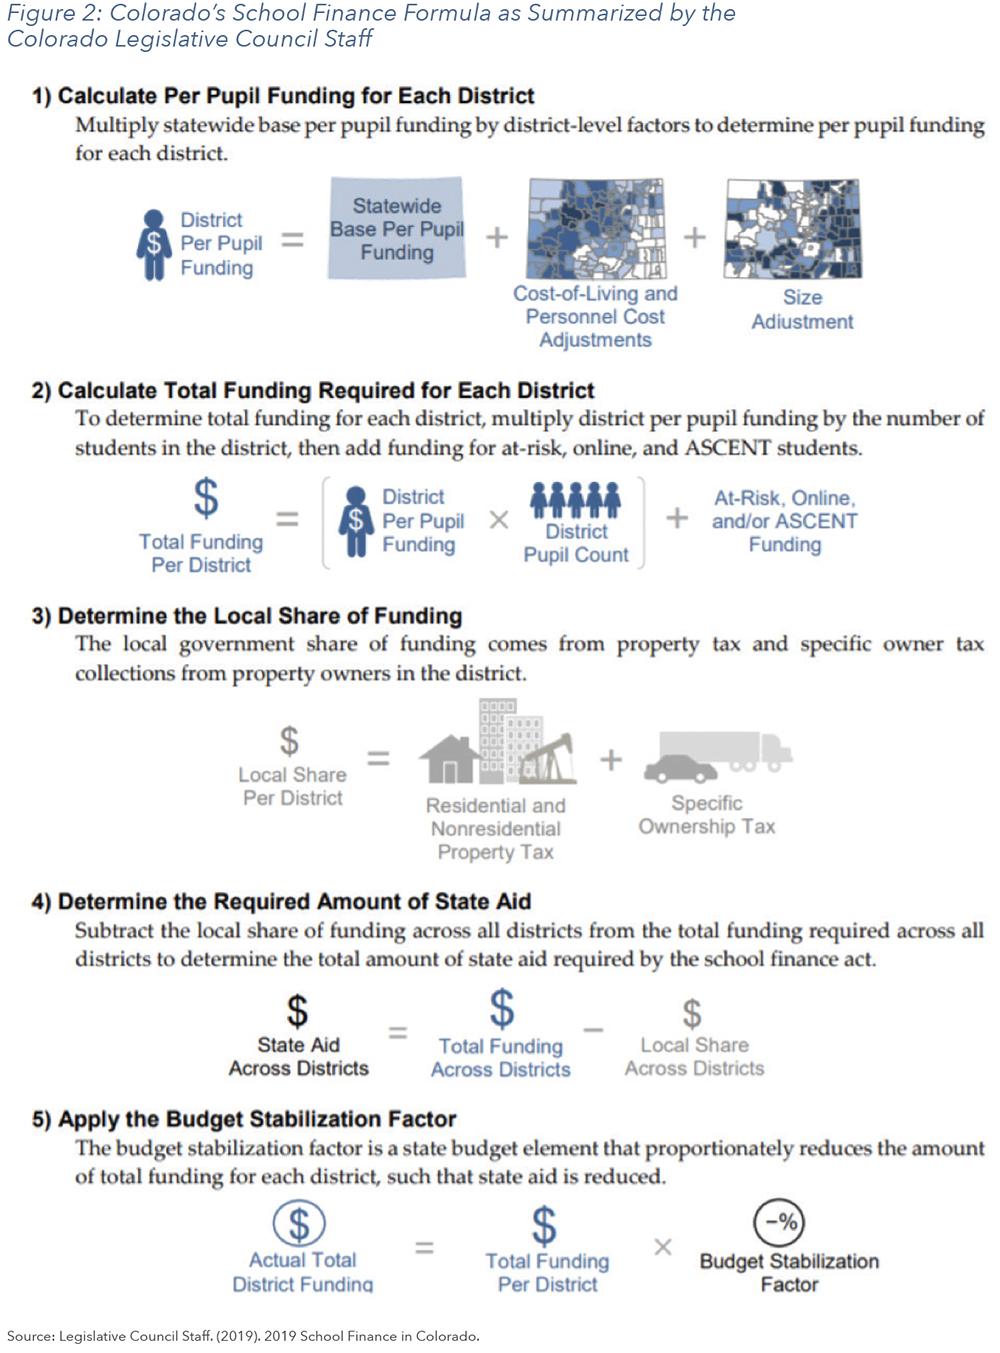 Figure 2: Colorado's School Finance Formula as Summarized by the Colorado Legislative Council Staff